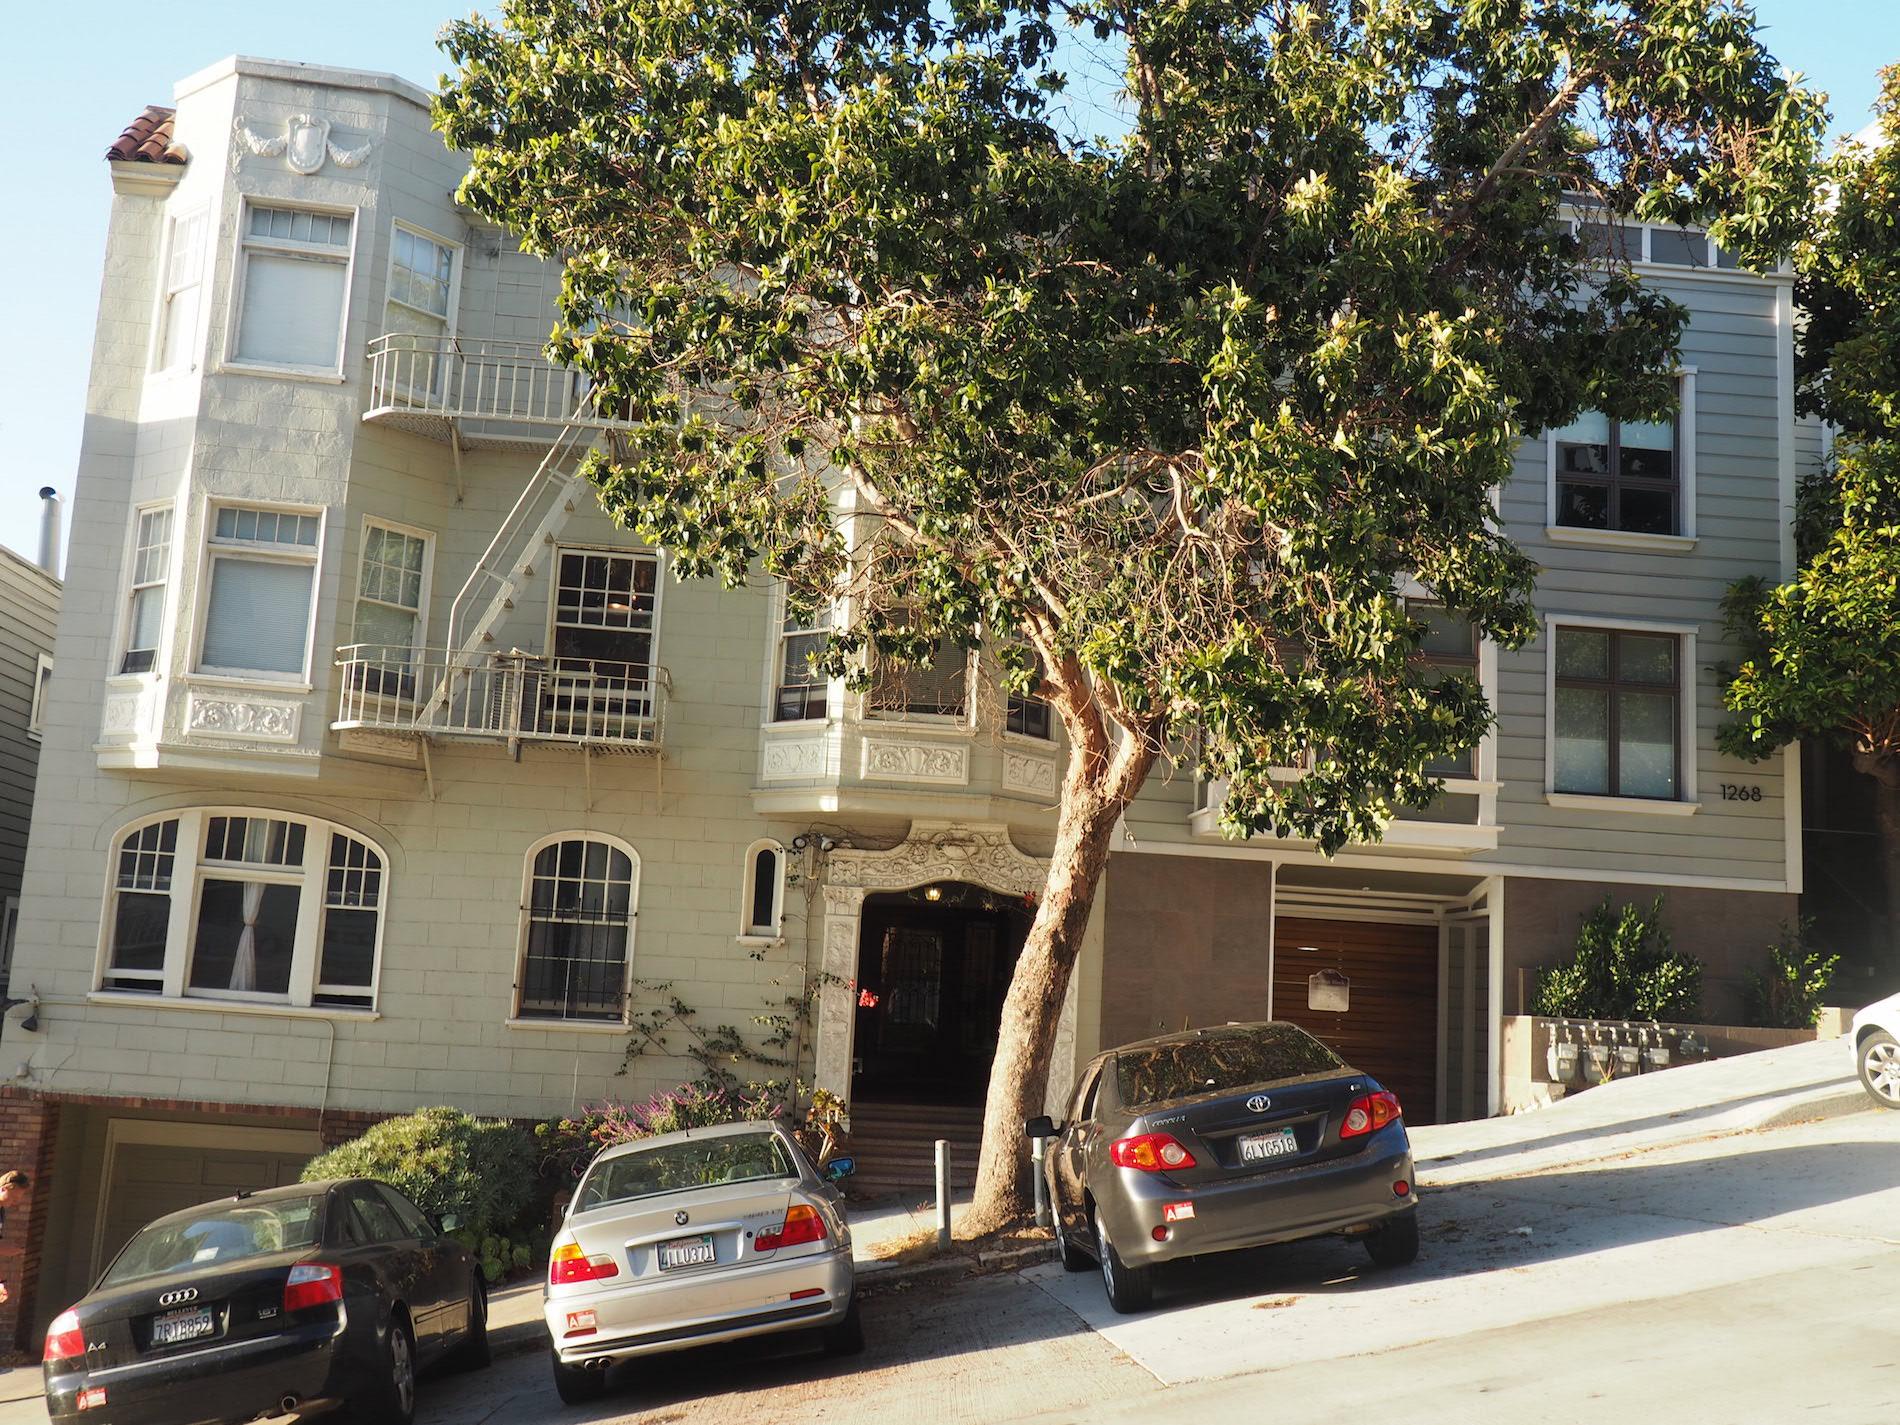 SanFrancisco-Lombard Street